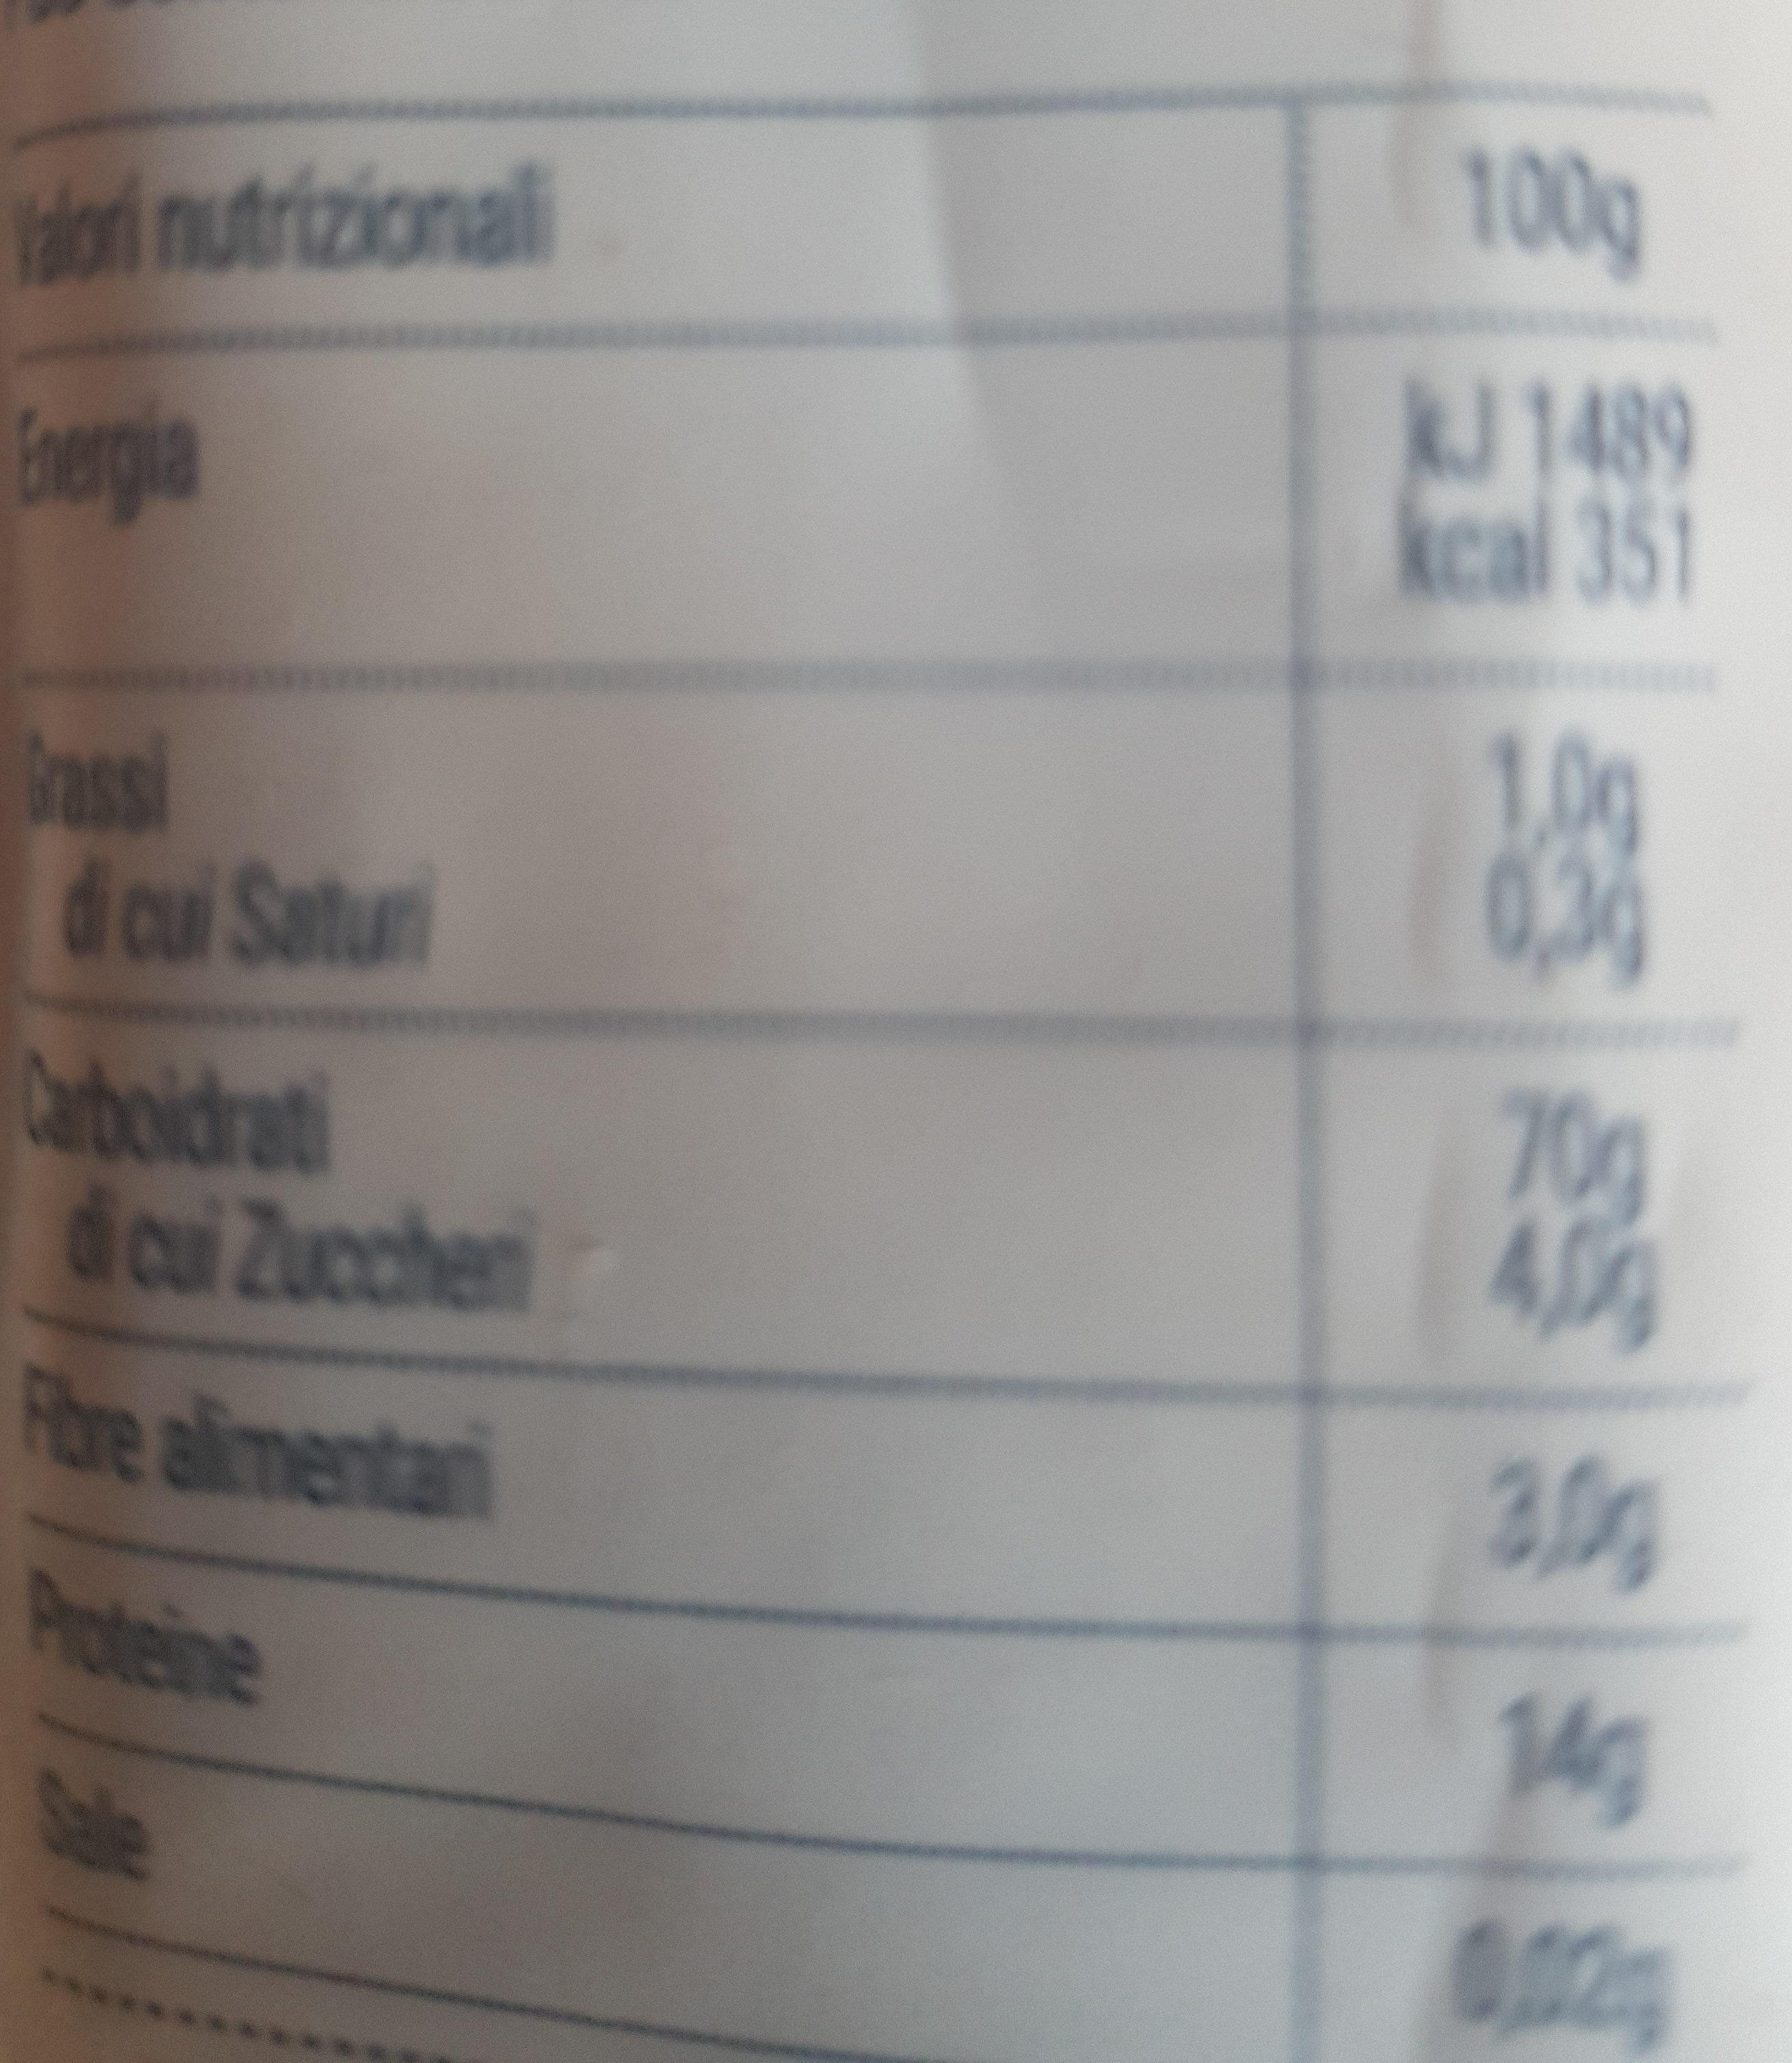 Pâtes Bucatini - Nutrition facts